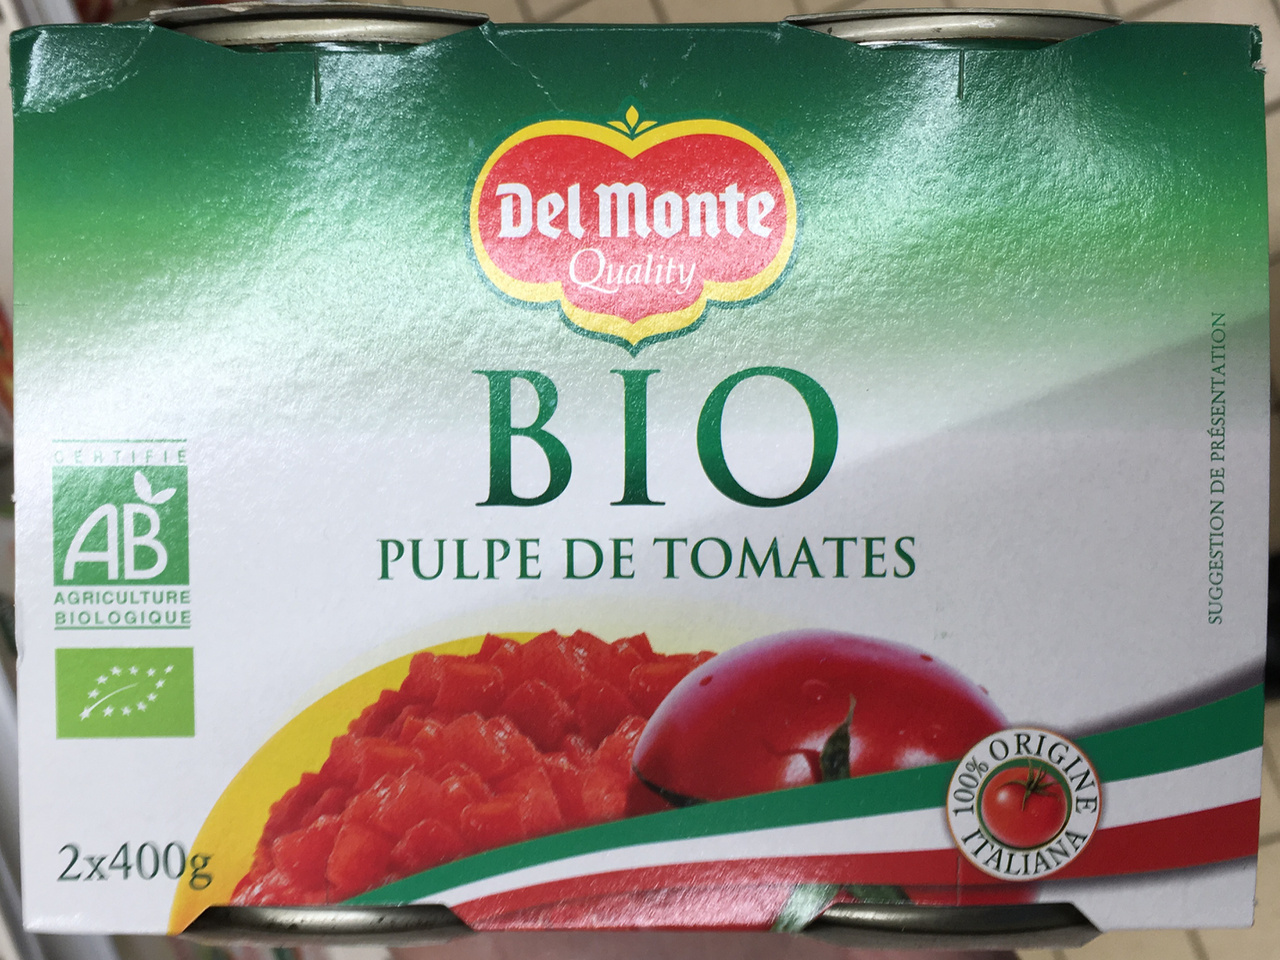 Pulpe de tomates bio - Product - fr